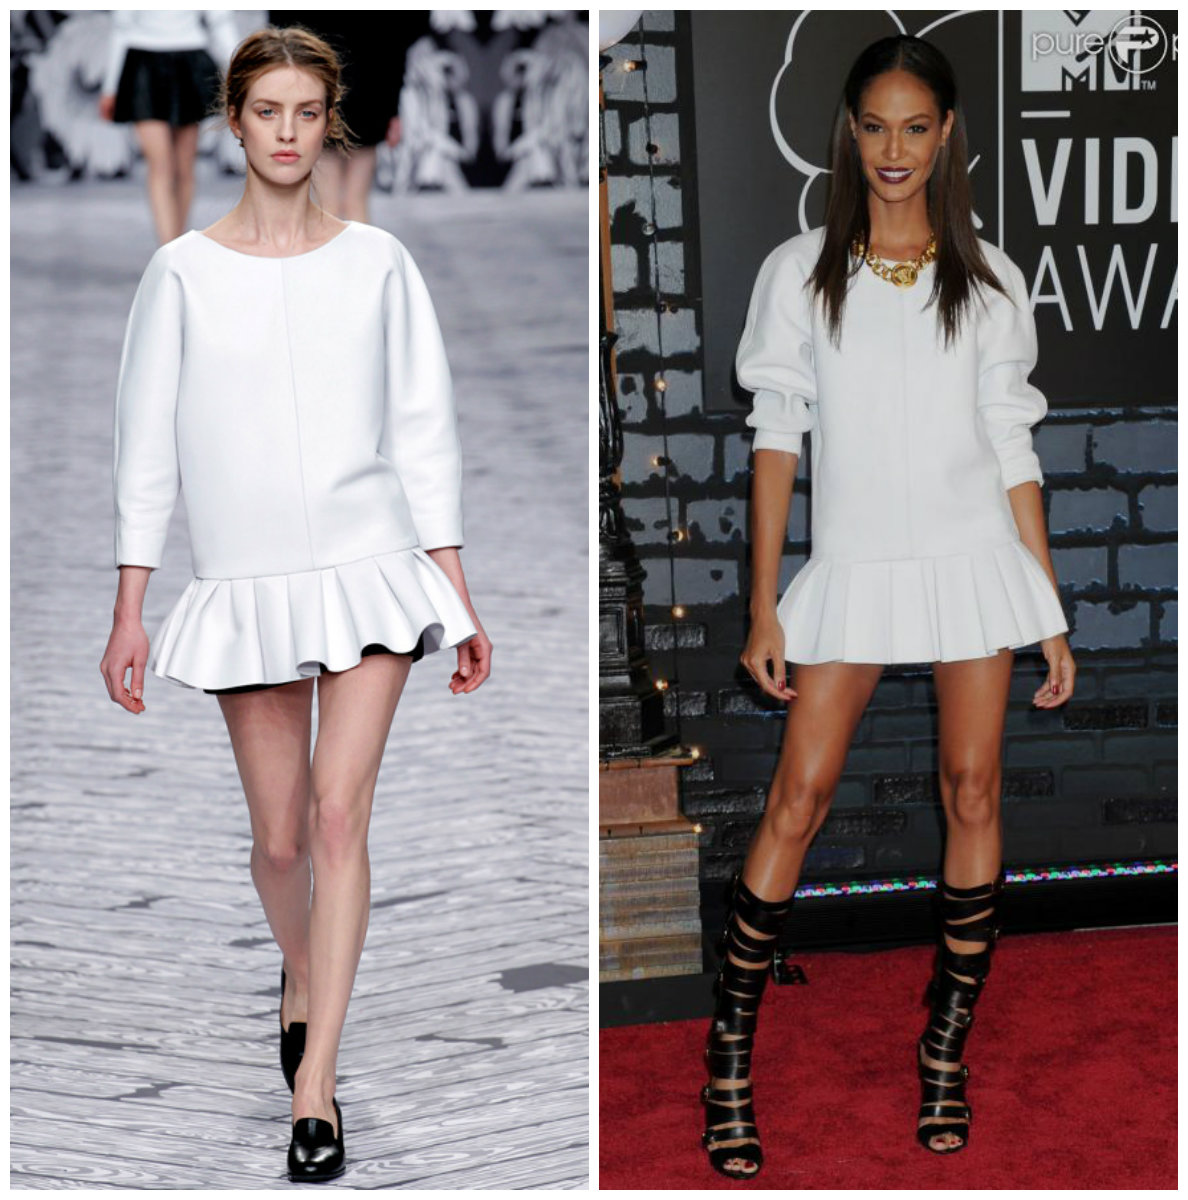 Joan smalls porte une mini robe blanche appartenant à la collection automne-hiver 2013-2014 de la maison Viktor & Rolf